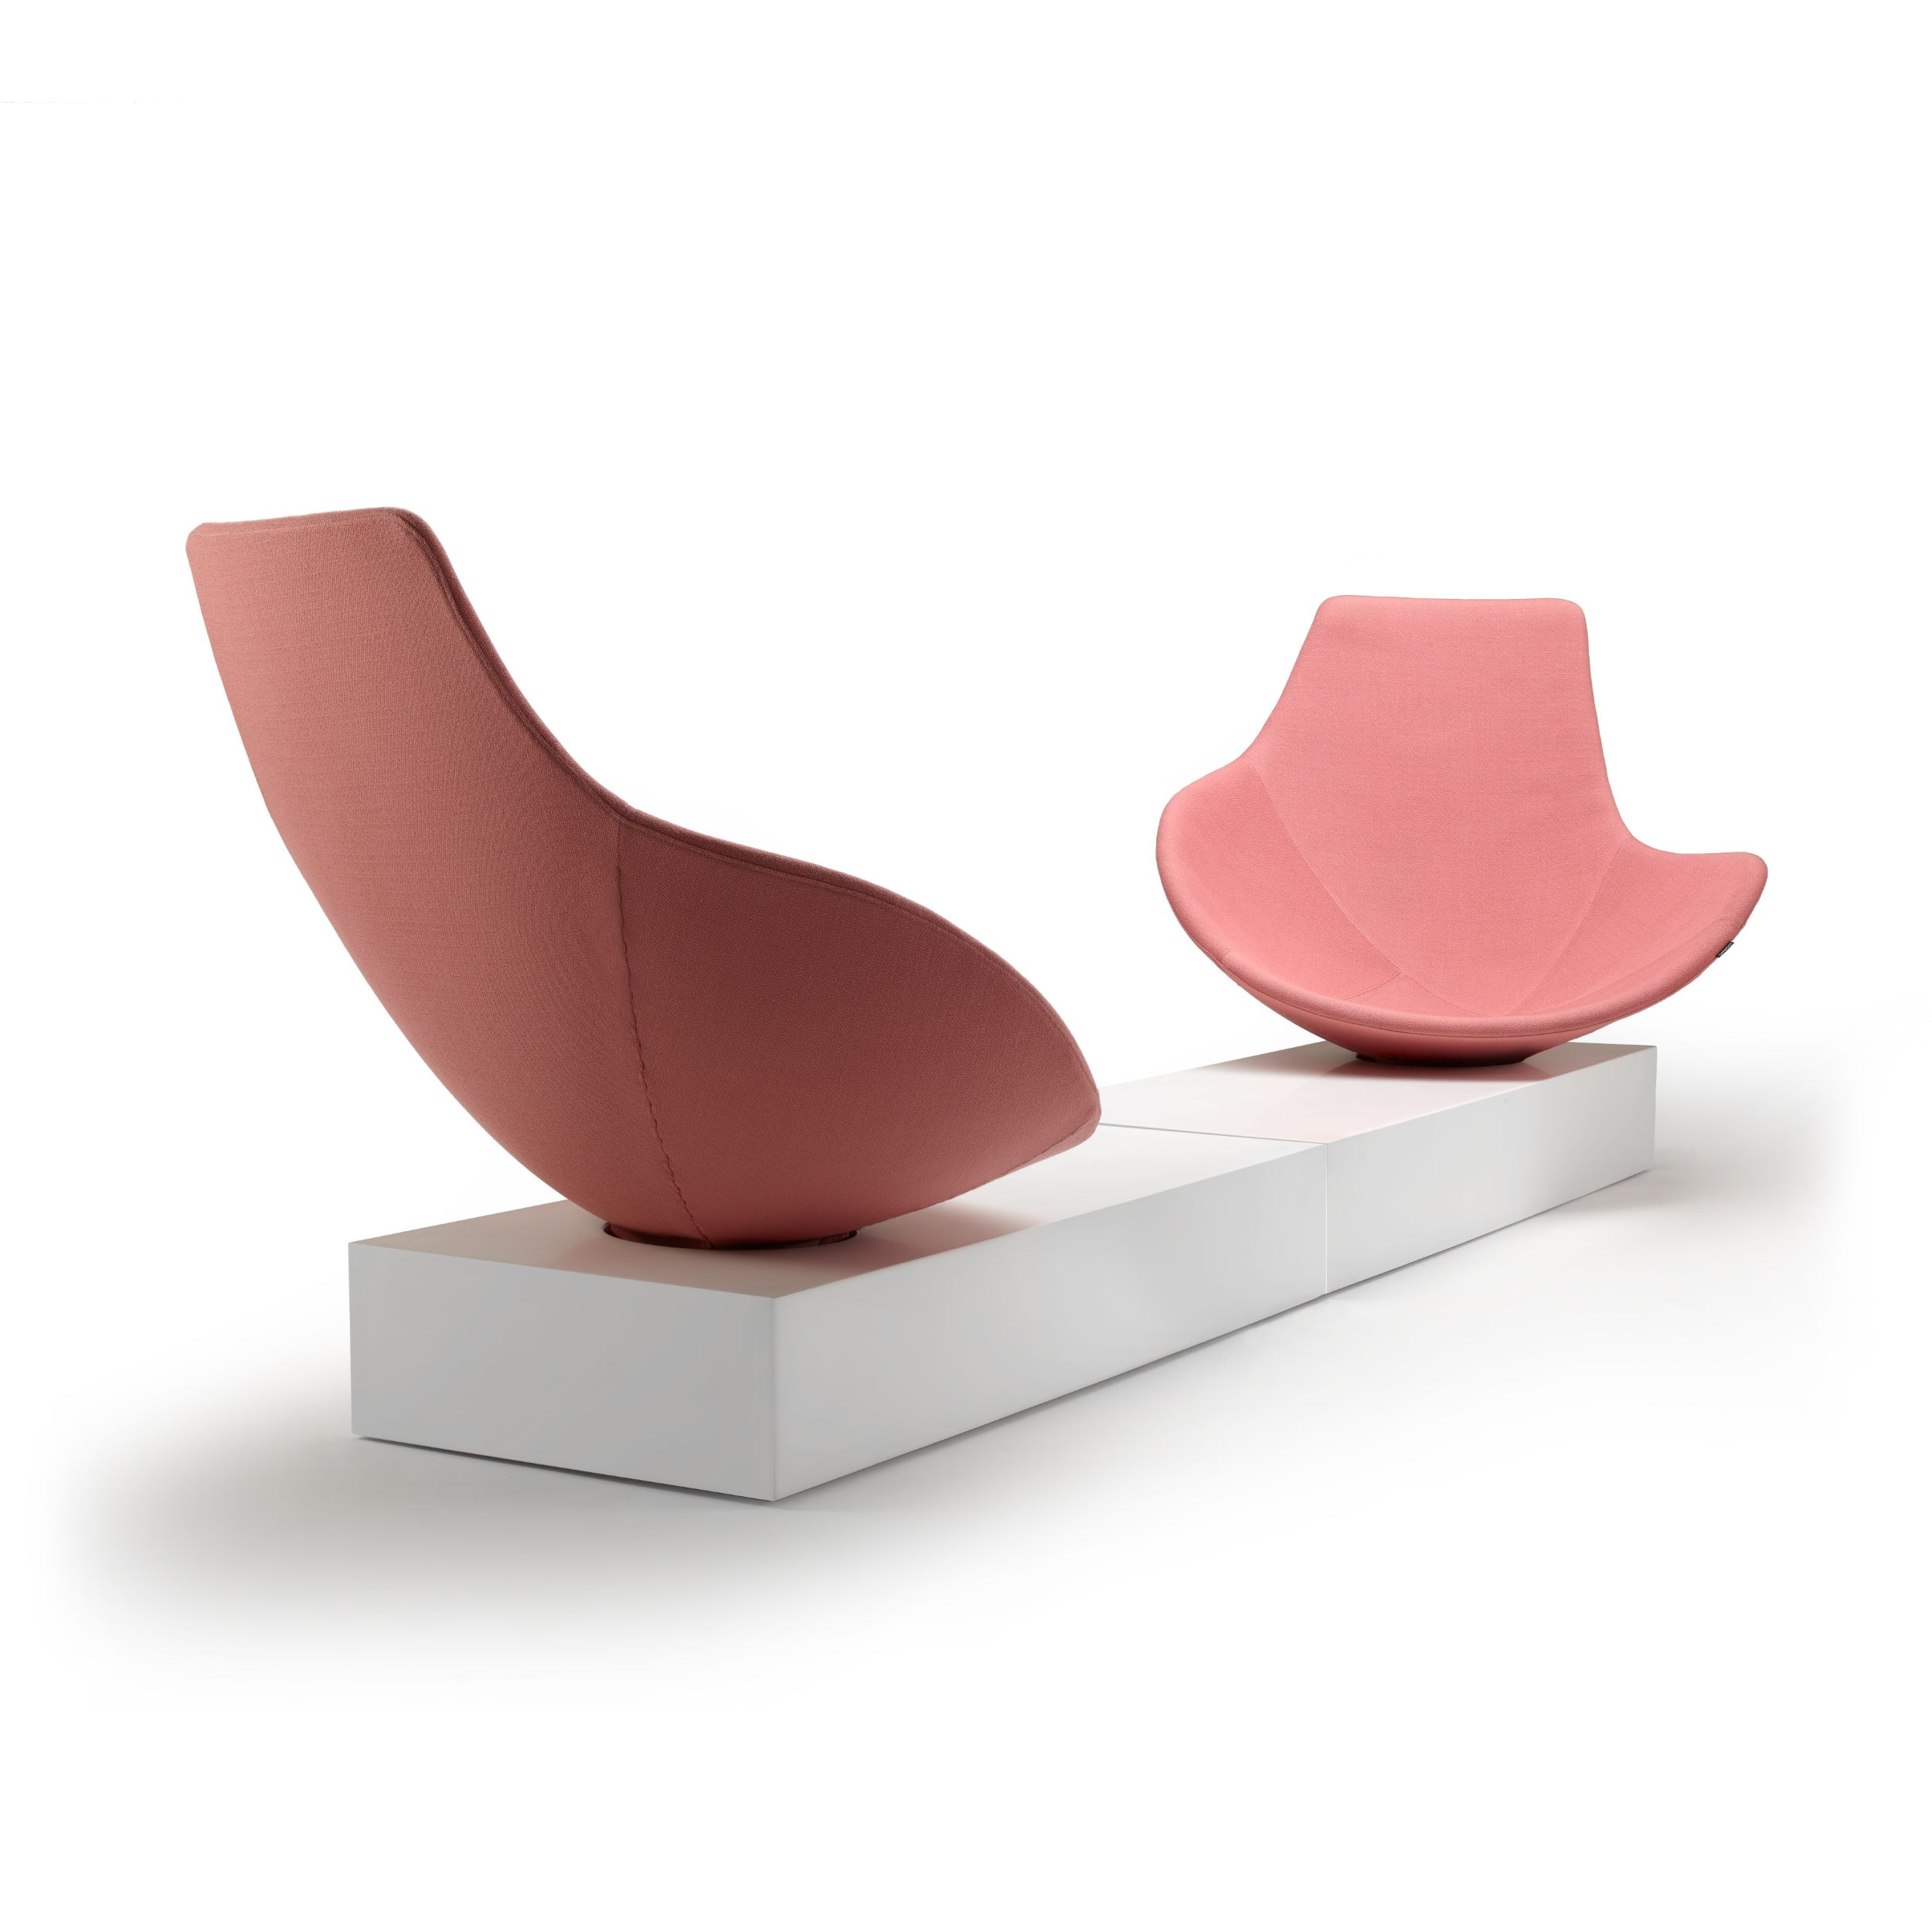 Vi Ar Offecct Ett Svenskt Designforetag Med Passion For Alla - Etage-modern-coffee-table-by-offecct